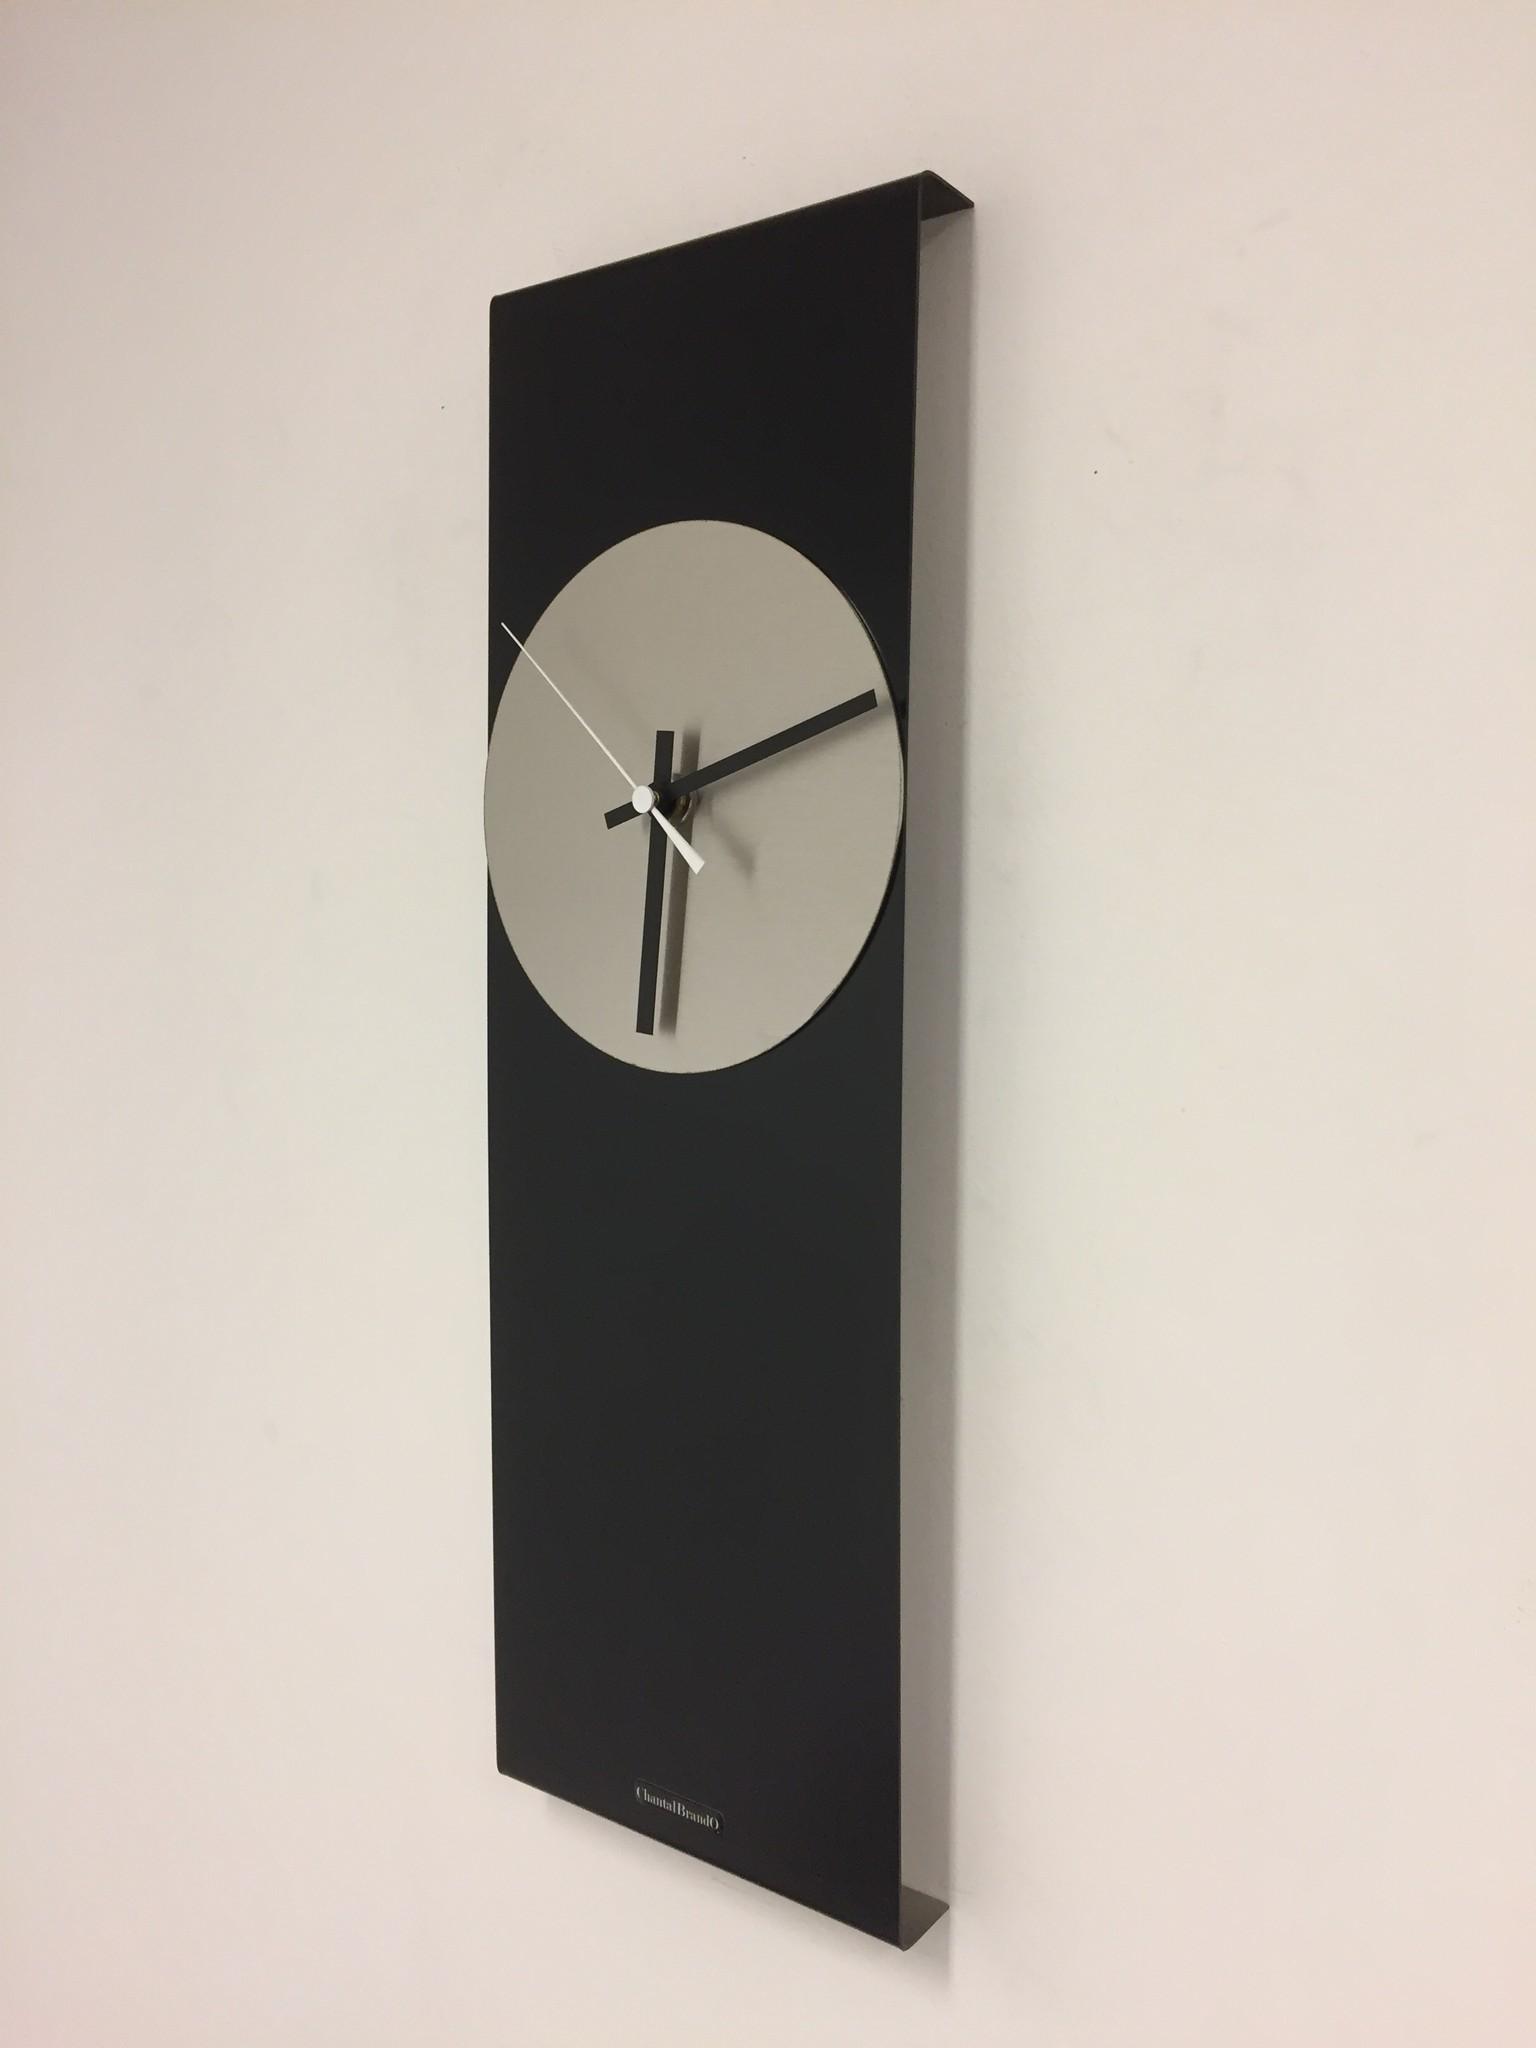 ChantalBrandO Wandklok LaBrand Export Design Black & White Pointer